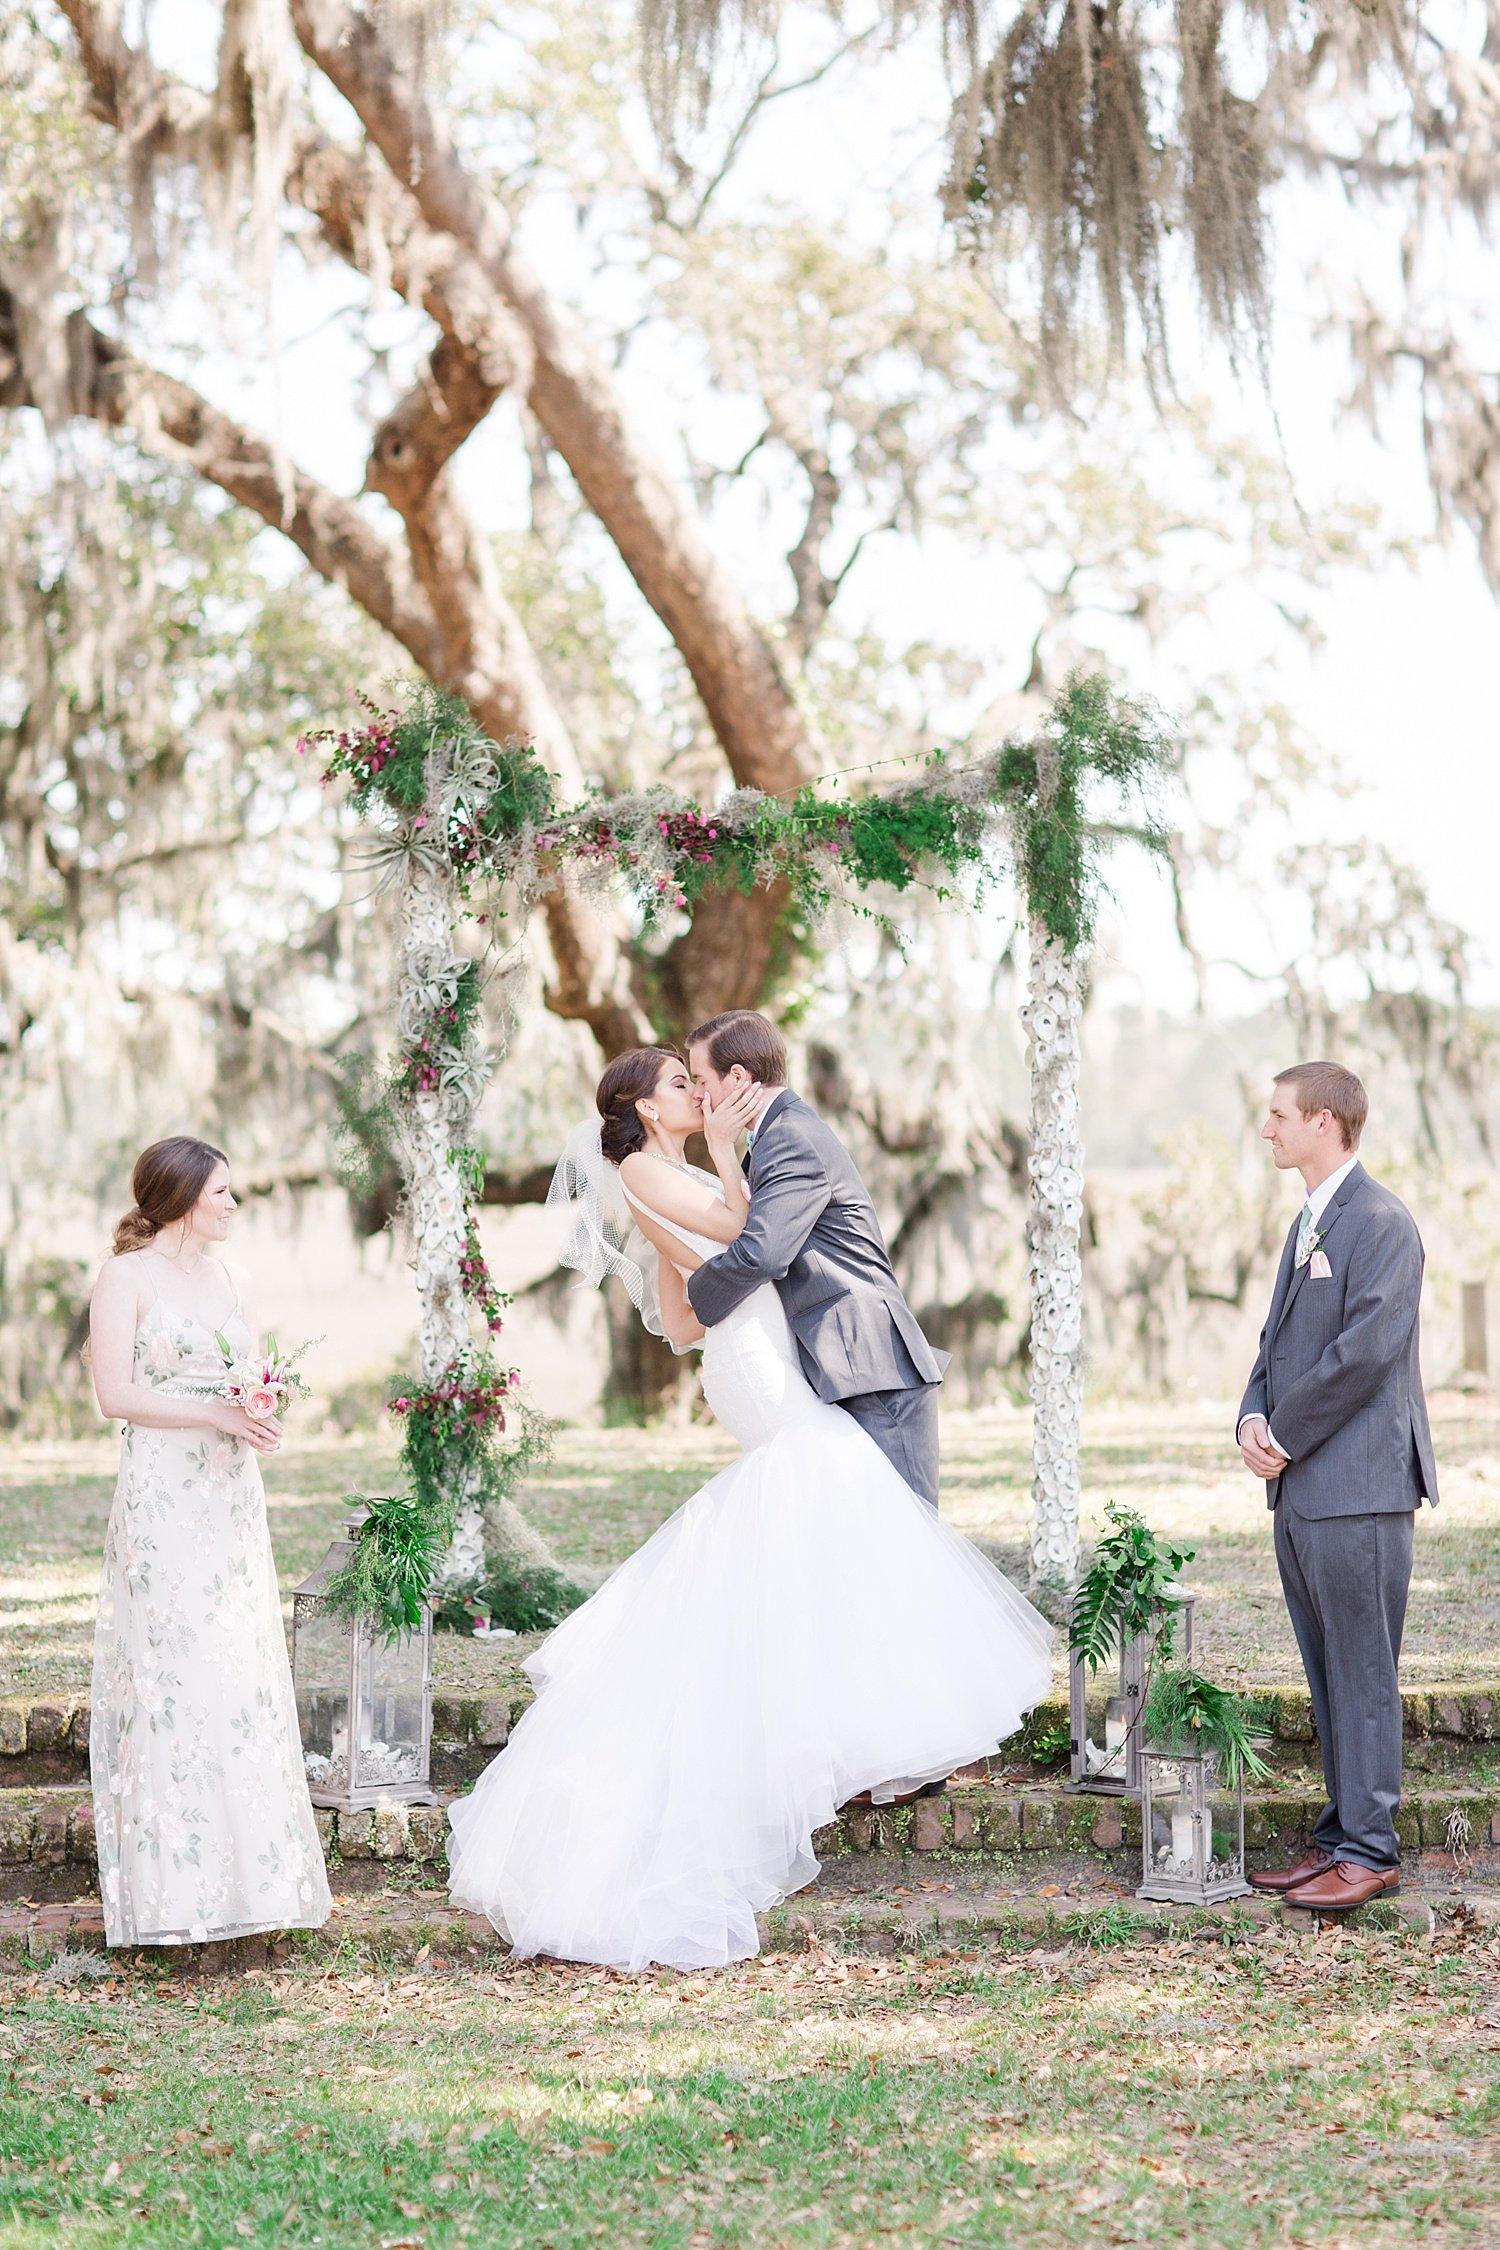 rachel-strickland-photography-katie-may-ivory-and-beau-bridal-boutique-bethesda-academy-wedding-whitfield-chapel-wedding-savannah-bridal-boutique-savannah-weddings-savannah-wedding-savannah-wedding-planner-savannah-bridal-gowns-savannah-bride-112.jpg